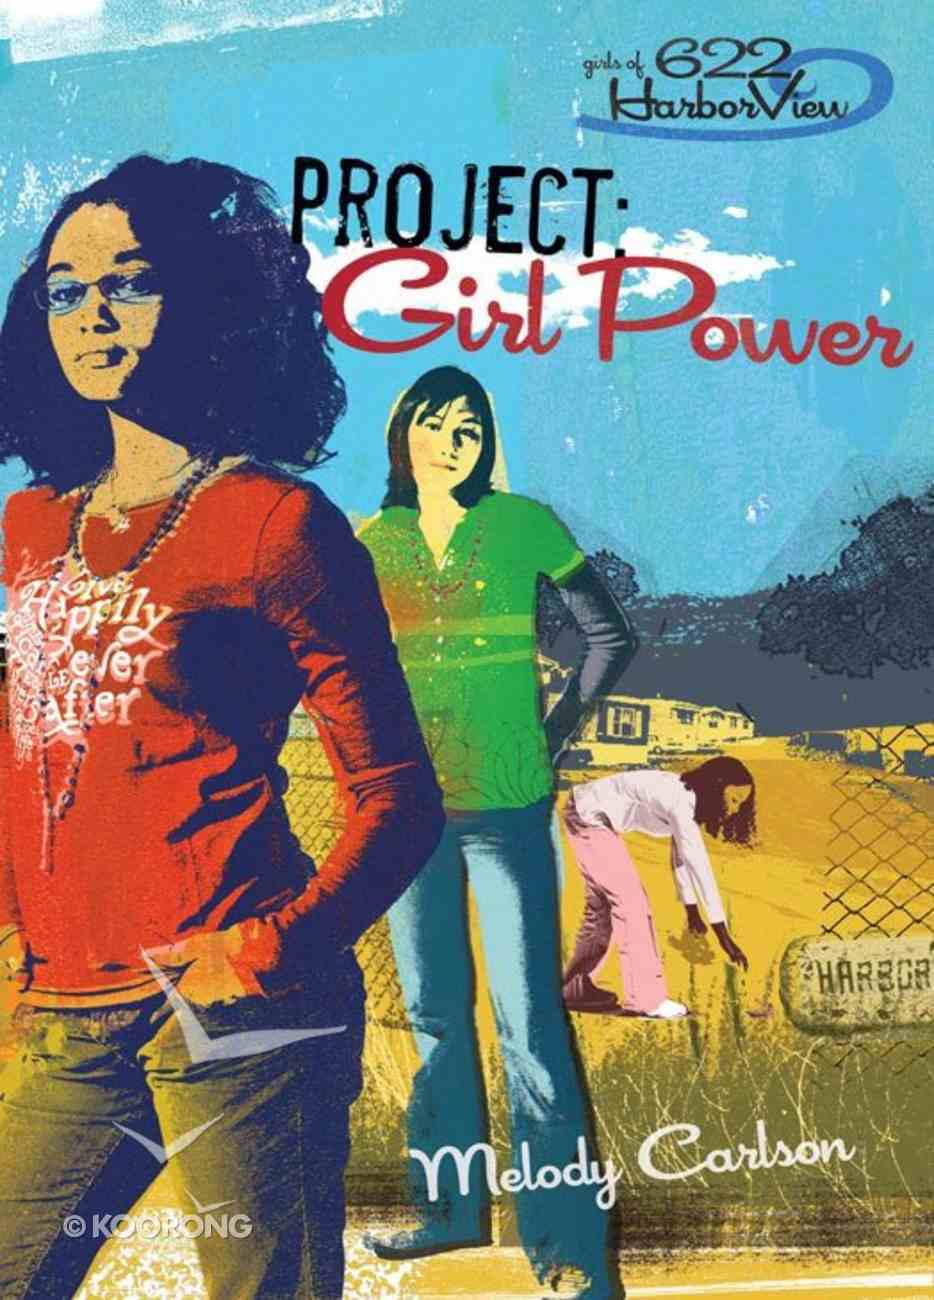 Faithgirlz! Girls of 622 Harbor View #01: Project Girl Power (#01 in Faithgirlz! Harbor View: Project Series) eBook